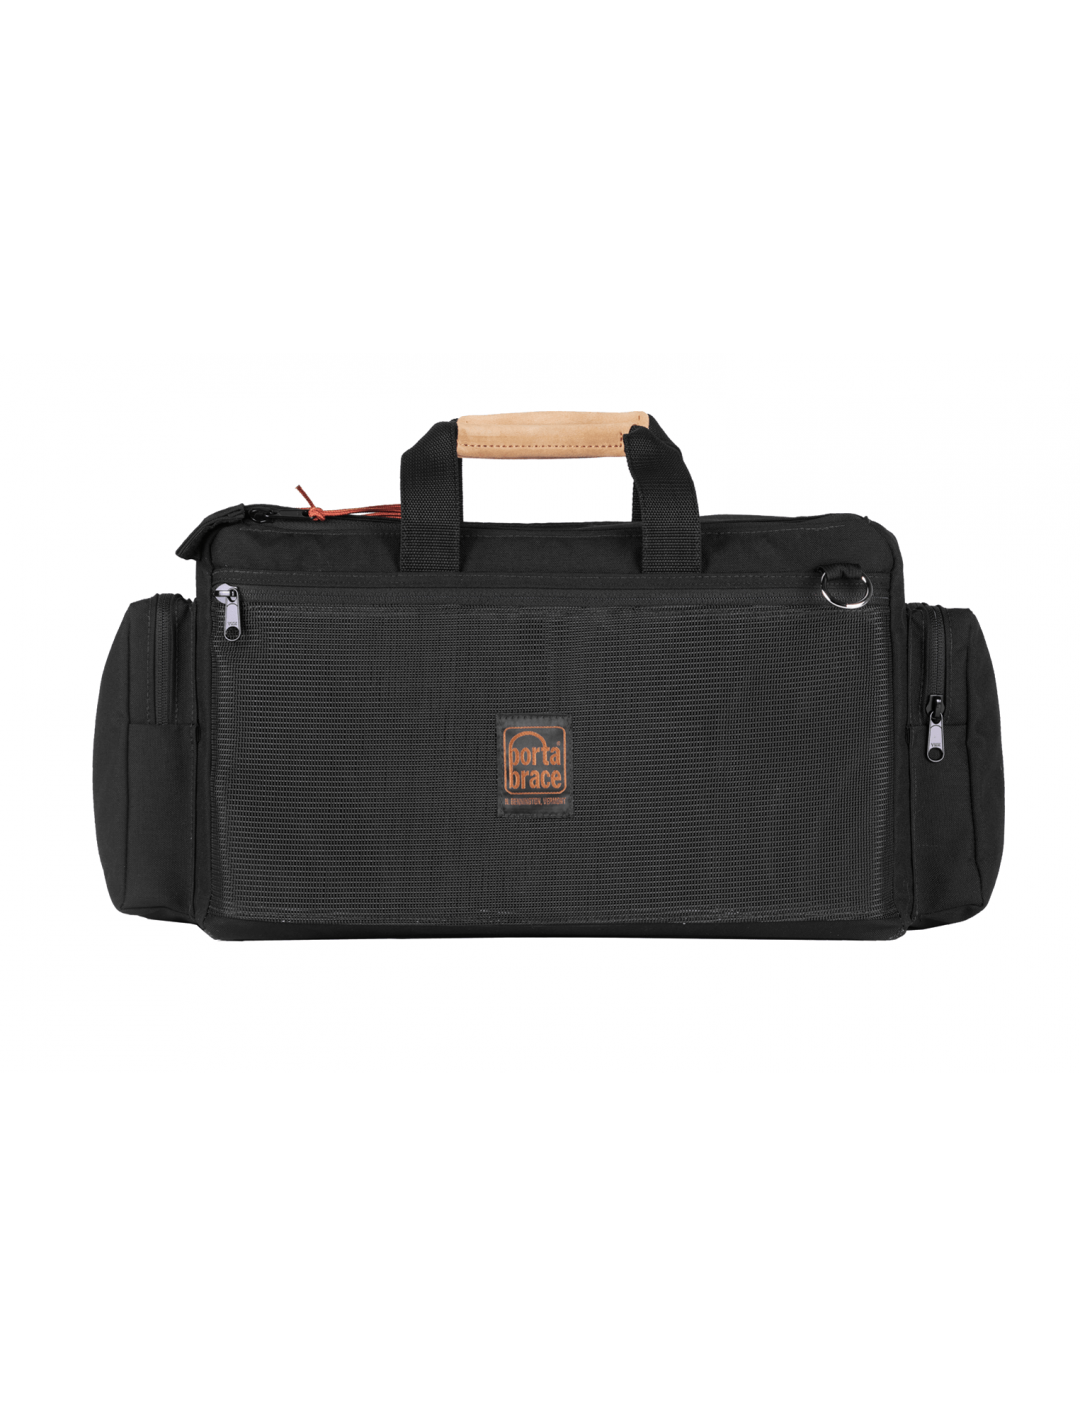 Porta Brace CAR-NX100 Saco de Transporte, para Sony HXR-NX100, Preto